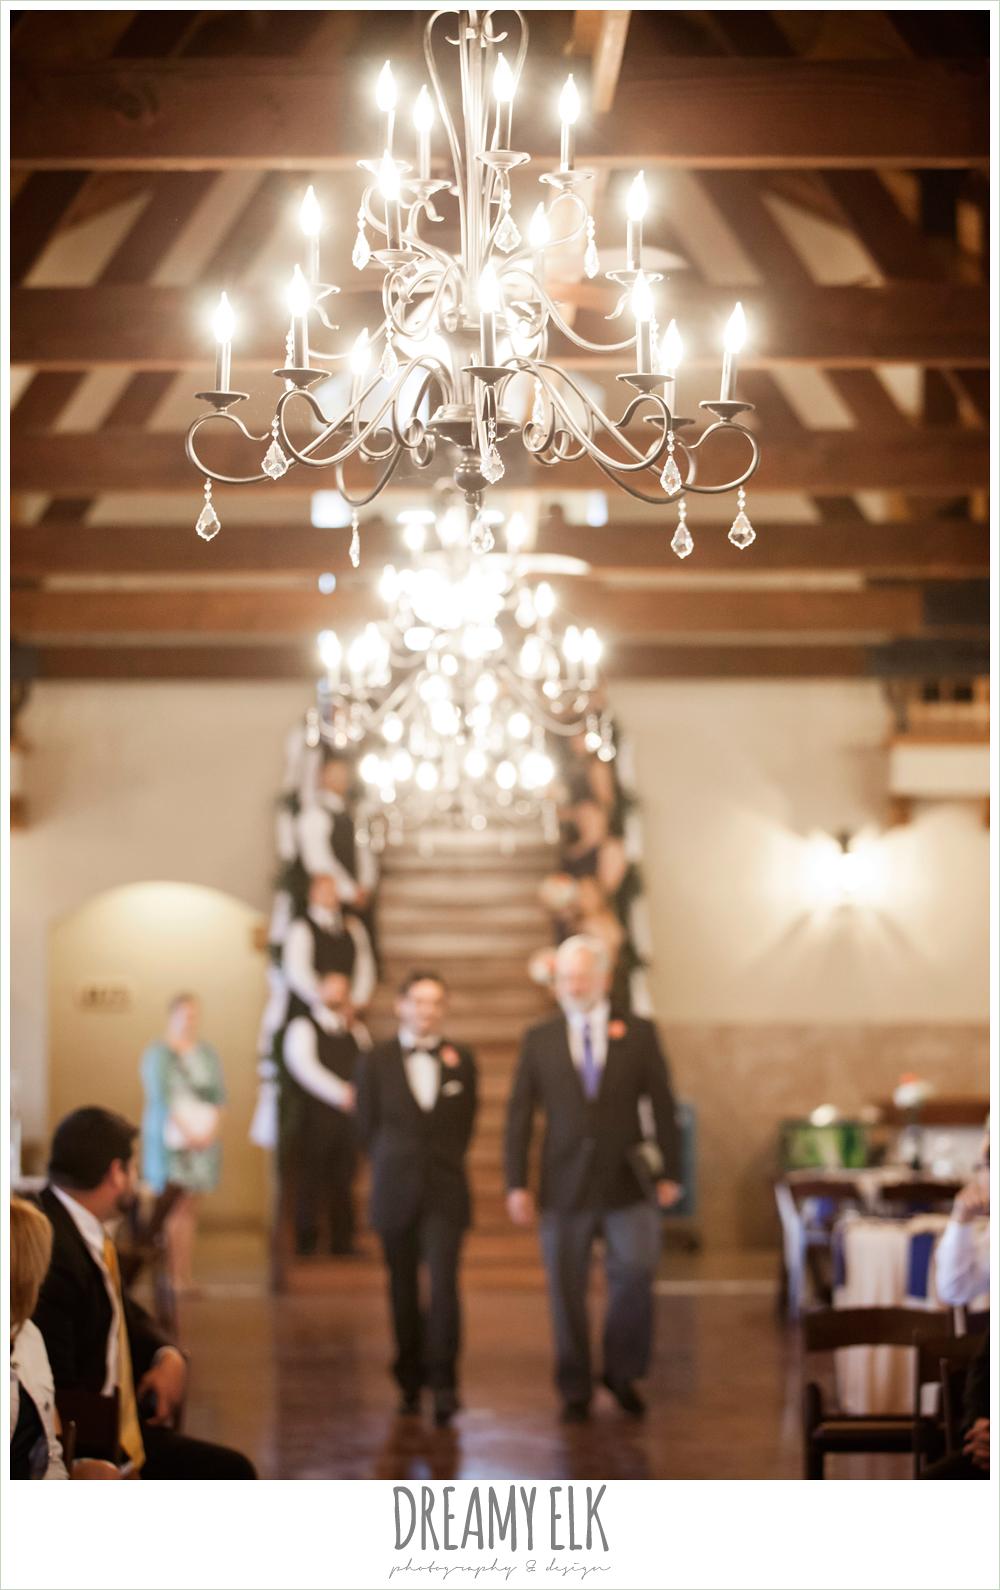 indoor wedding ceremony, chandeliers, pecan springs, houston, texas, photo {dreamy elk photography and design}